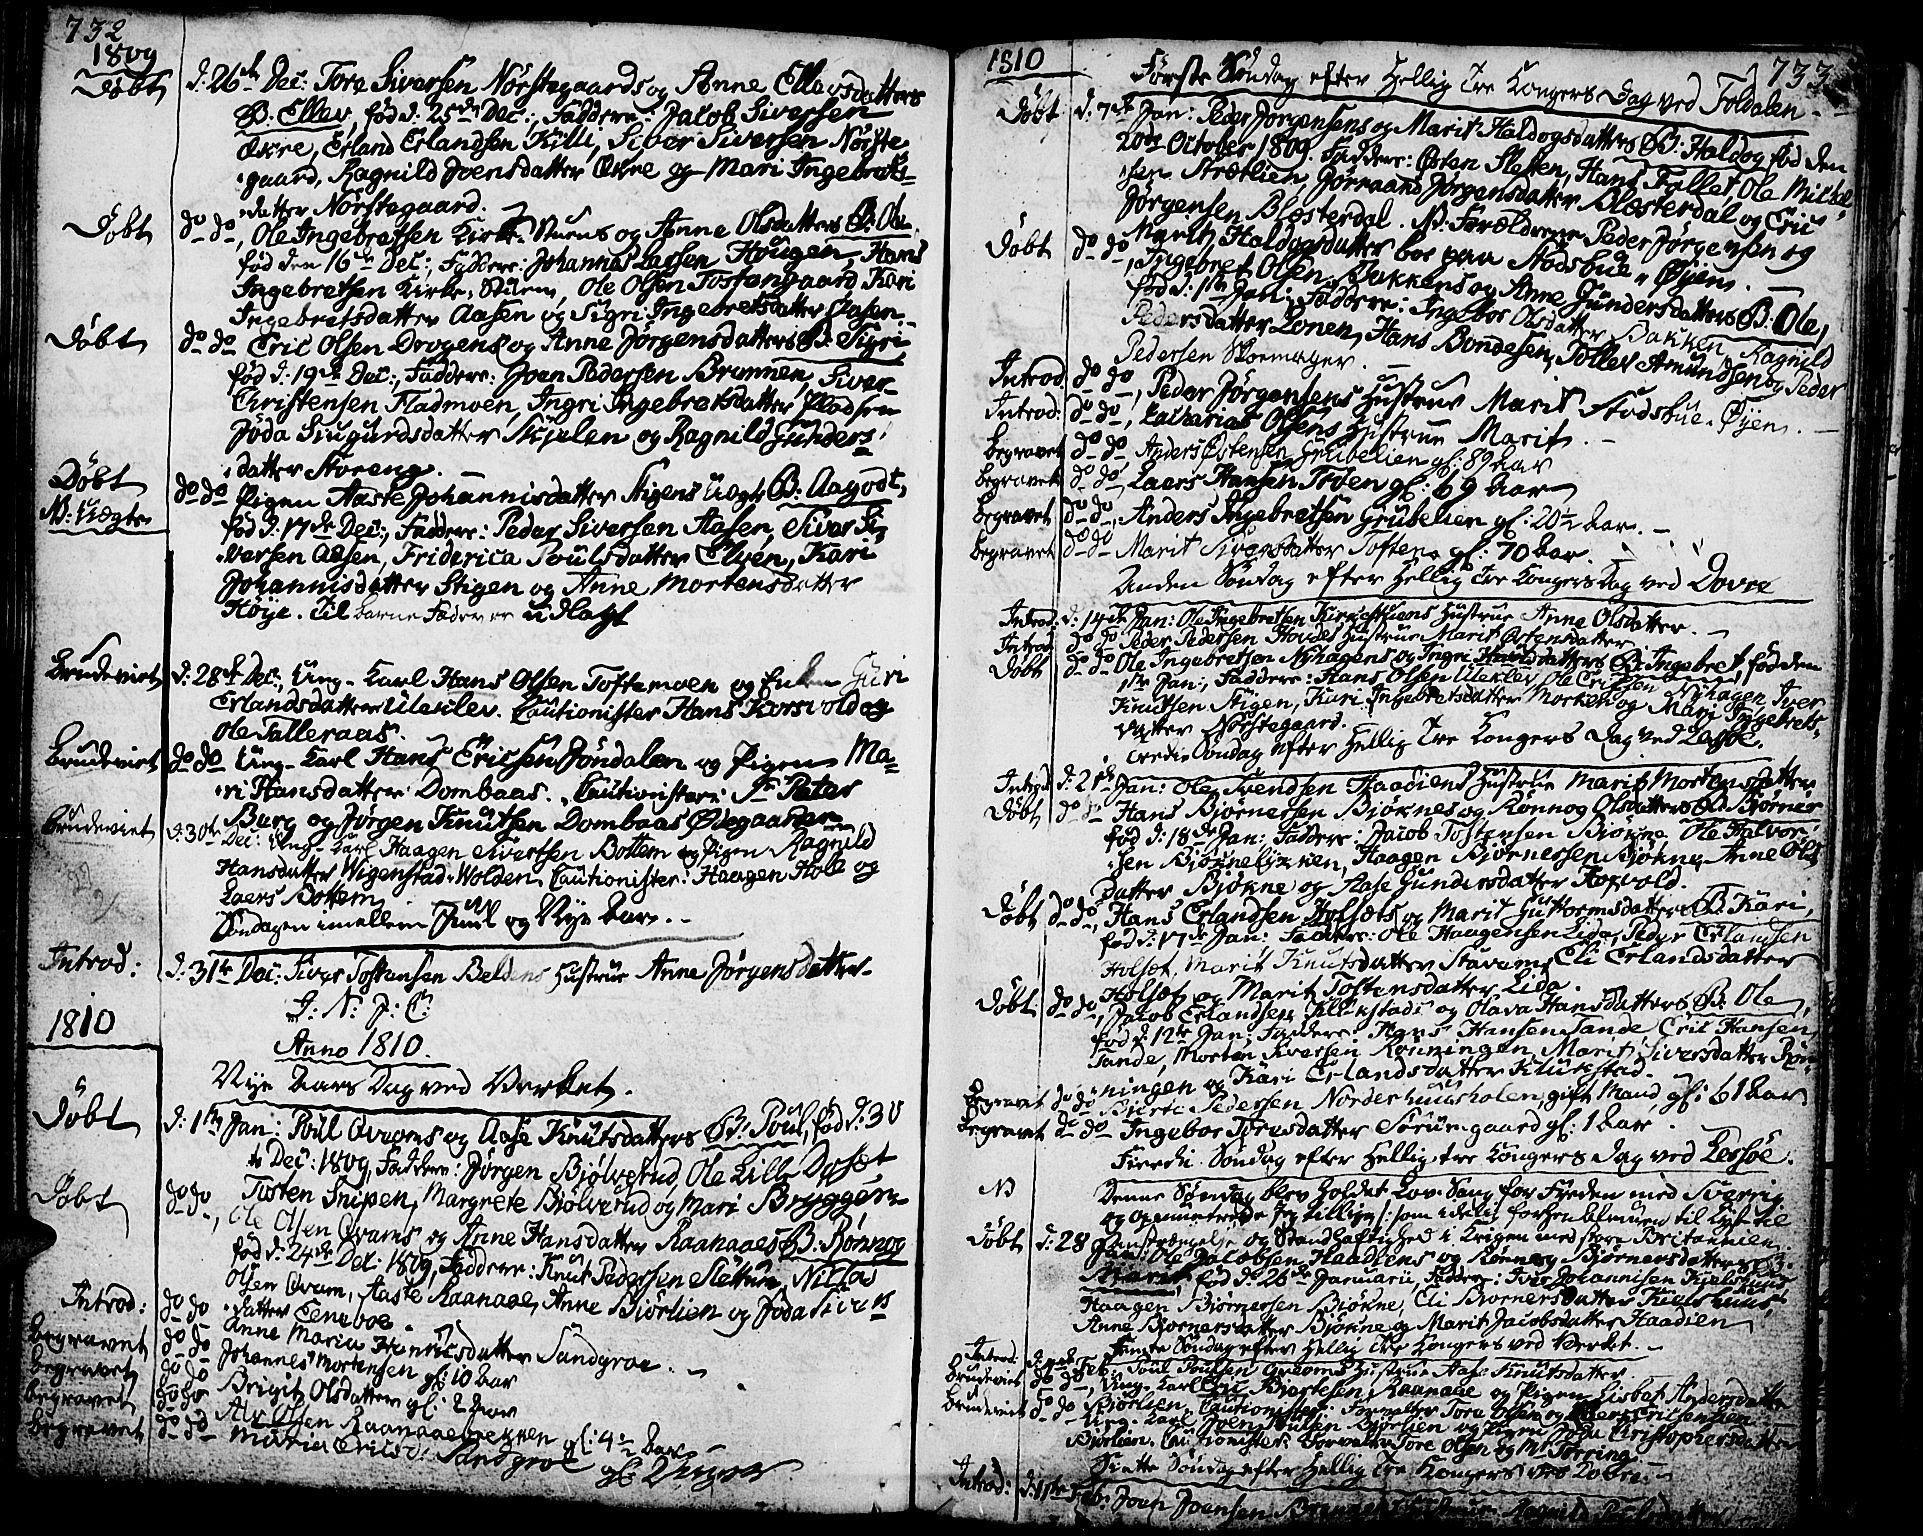 SAH, Lesja prestekontor, Ministerialbok nr. 3, 1777-1819, s. 732-733